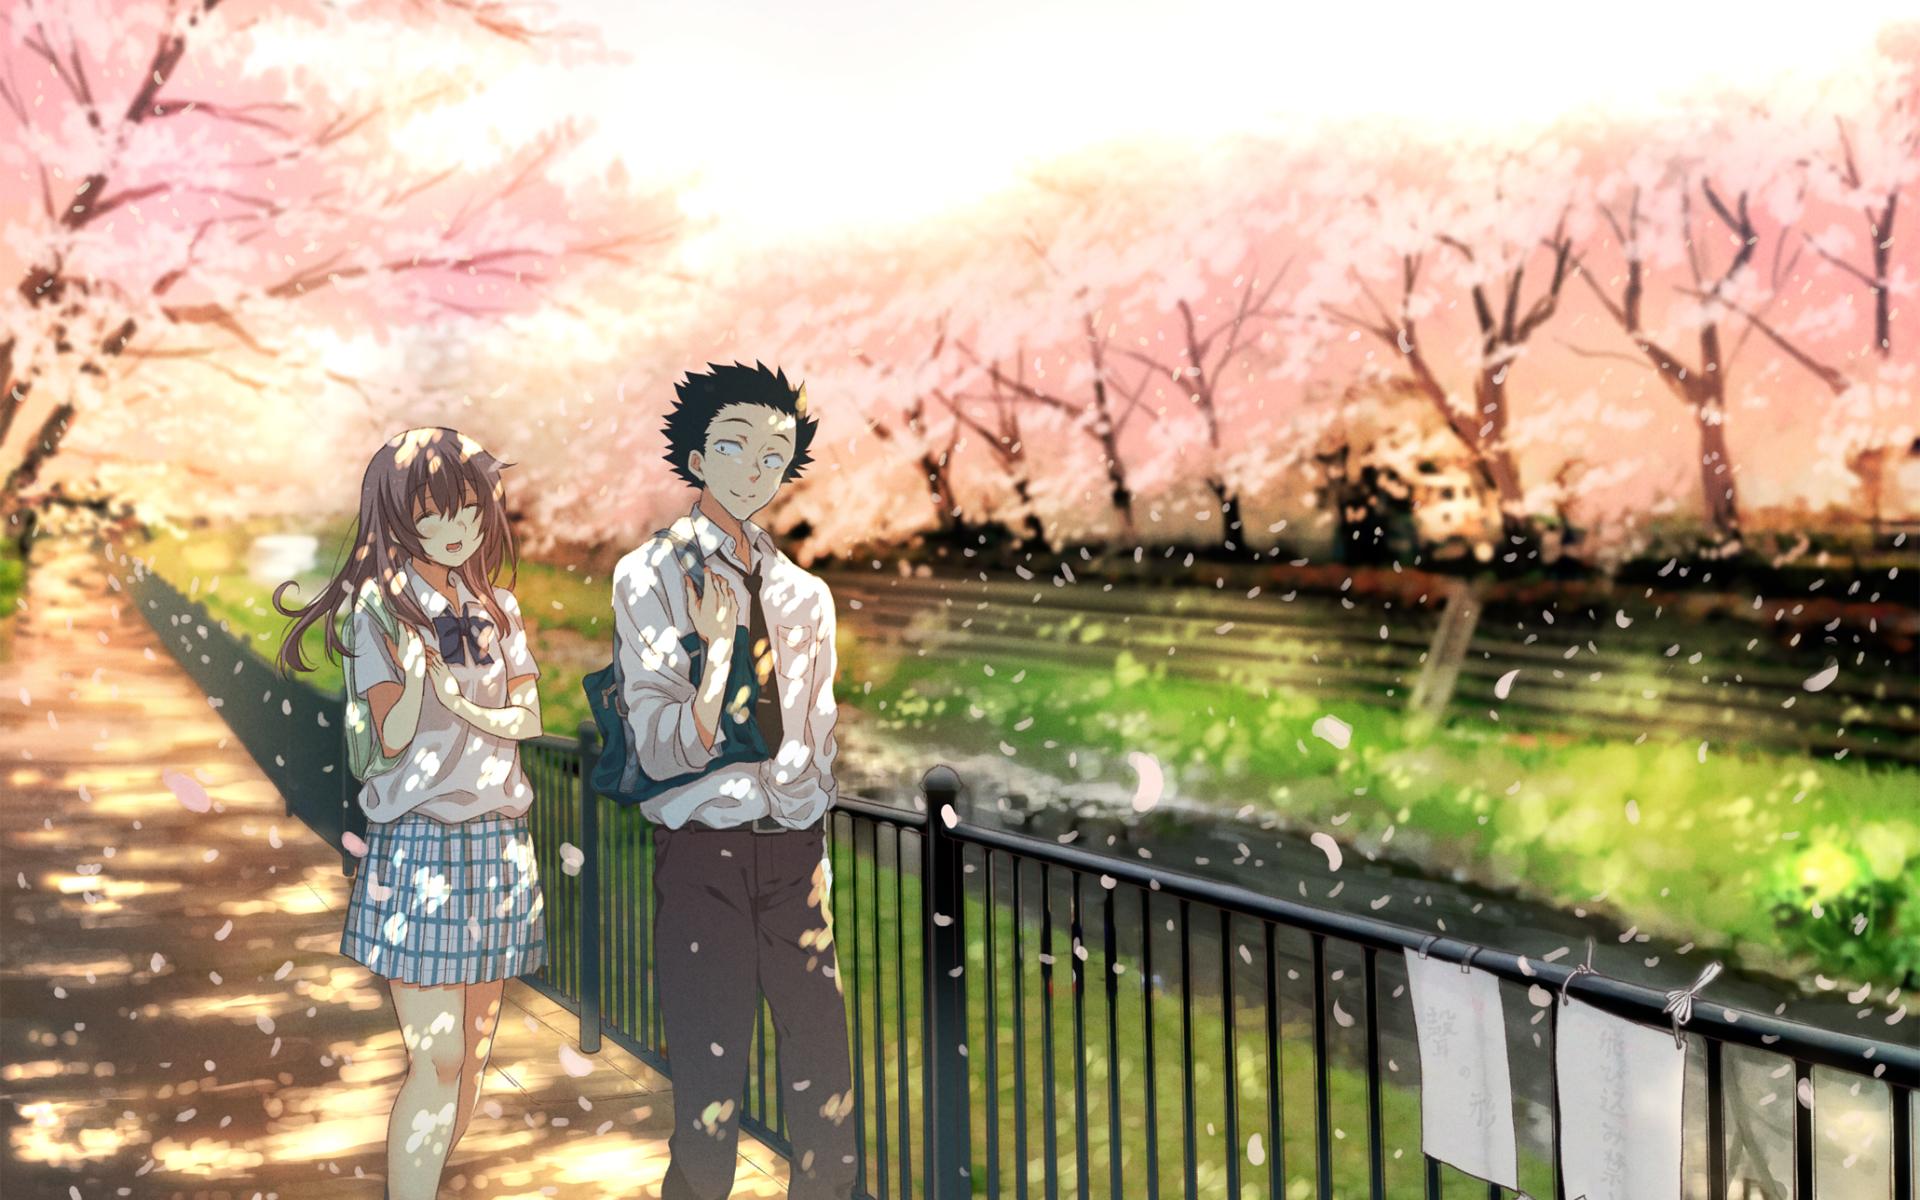 Koe No Katachi Wallpaper Koe No Katachi Wallpaper 40438206